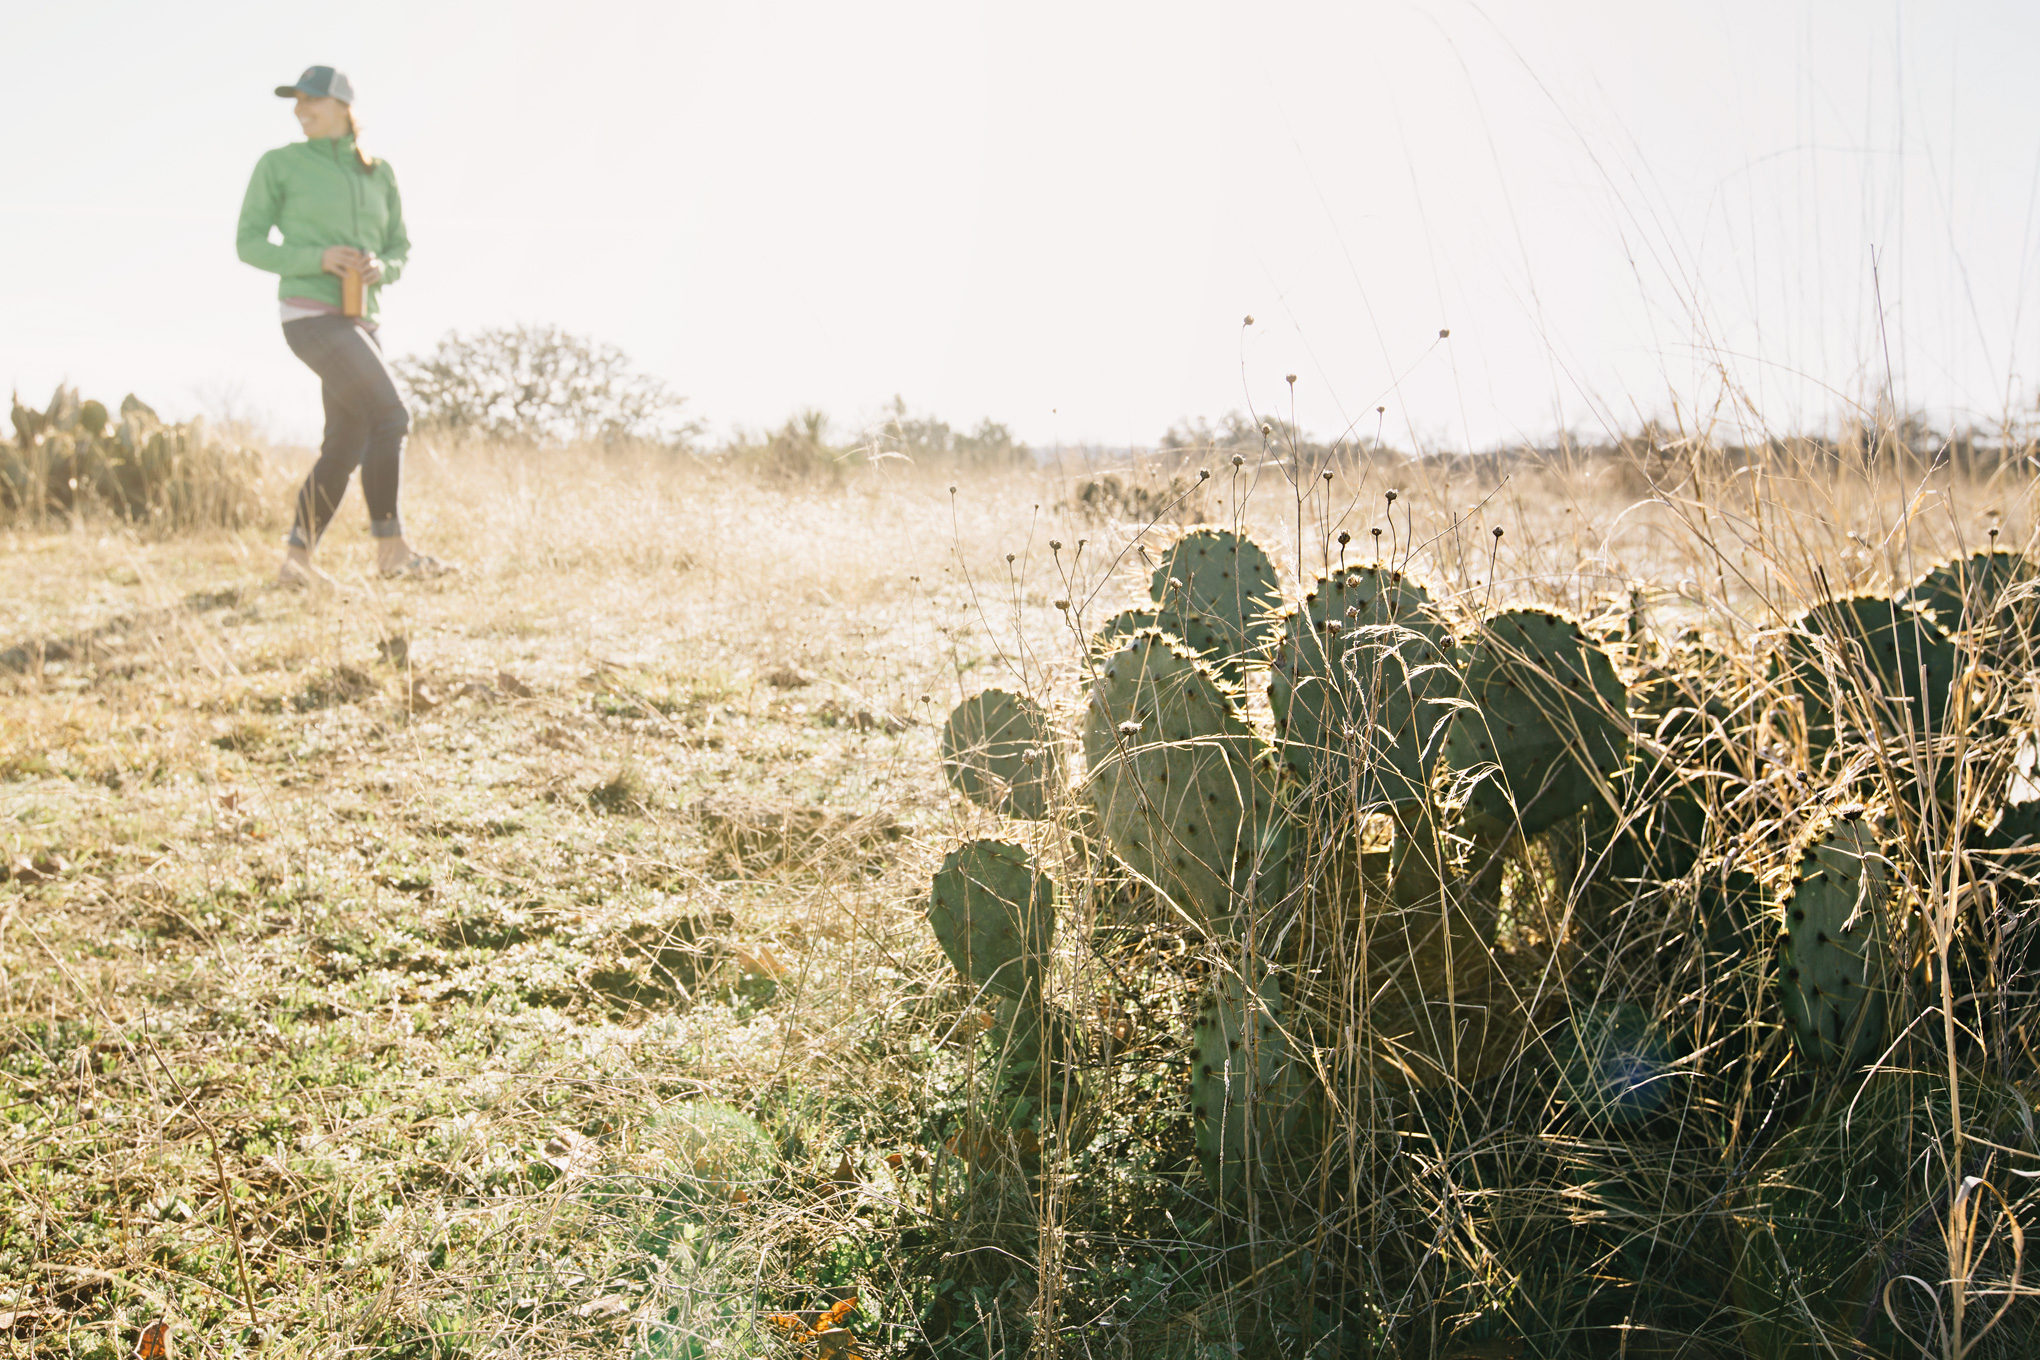 CindyGiovagnoli_Fredricksburg_Texas_HillCountry_EnchantedRock_StateParks_tourism.jpg